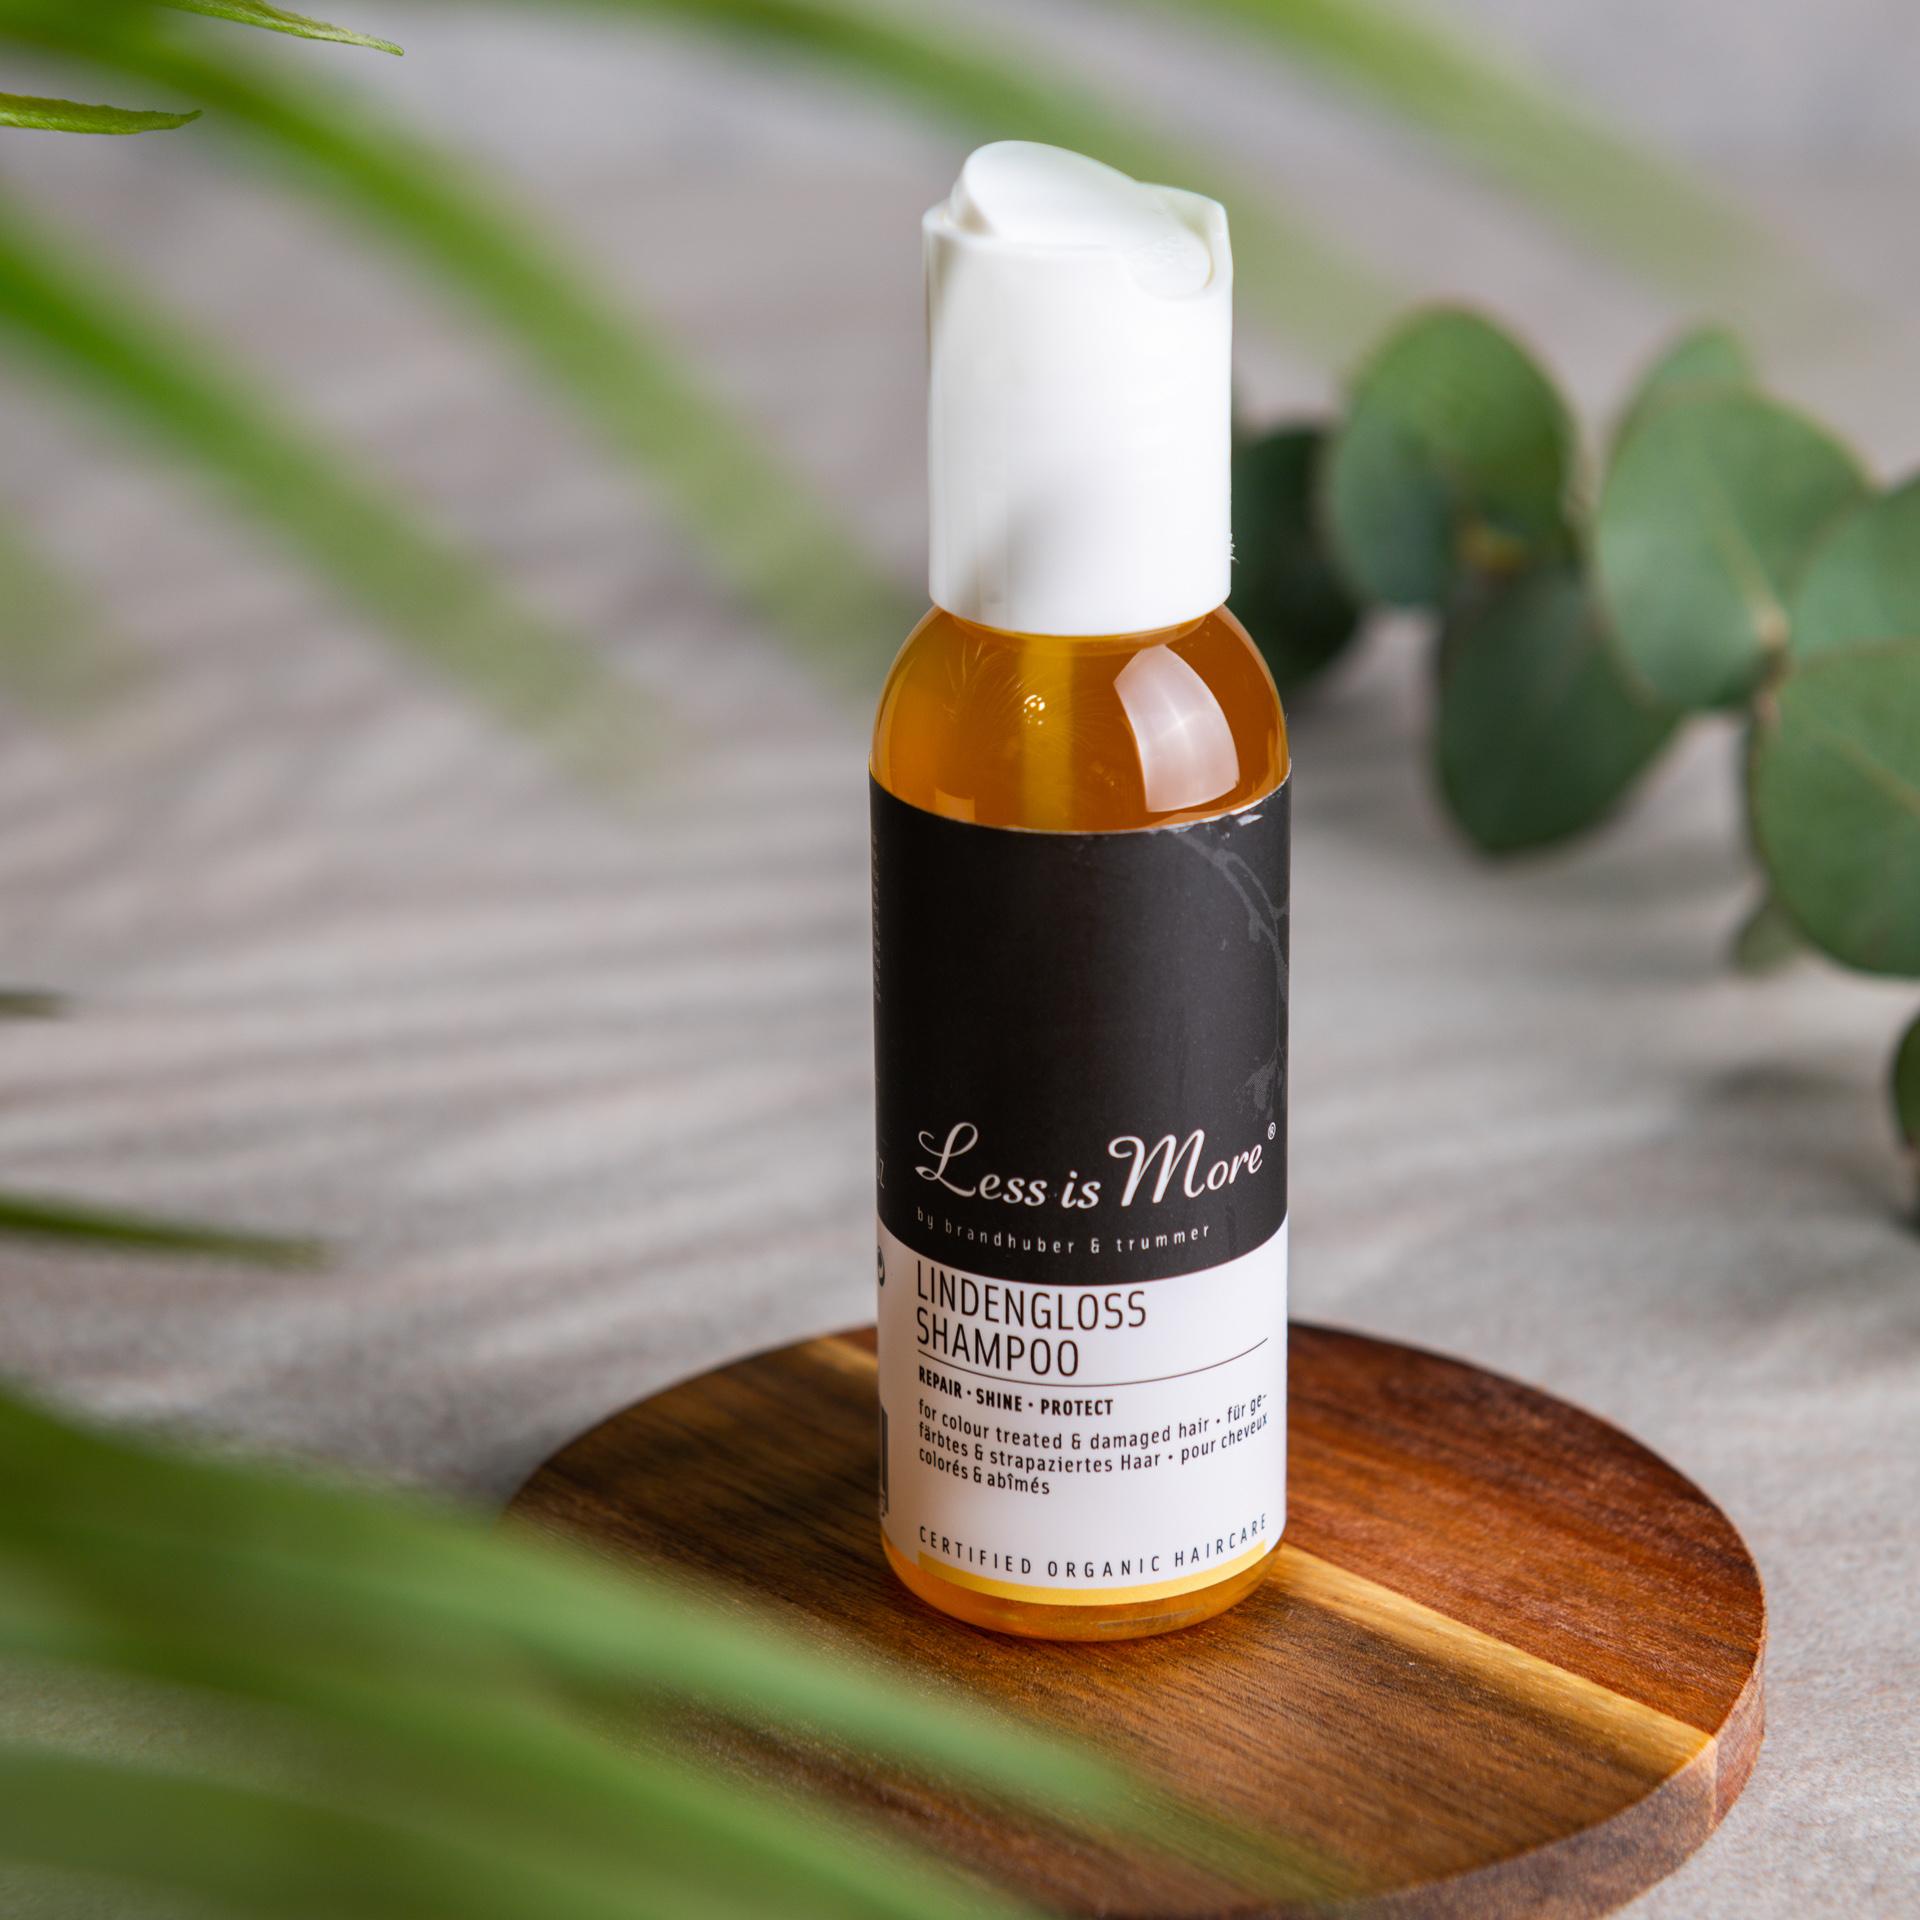 Lindengloss Shampoo Travel Size